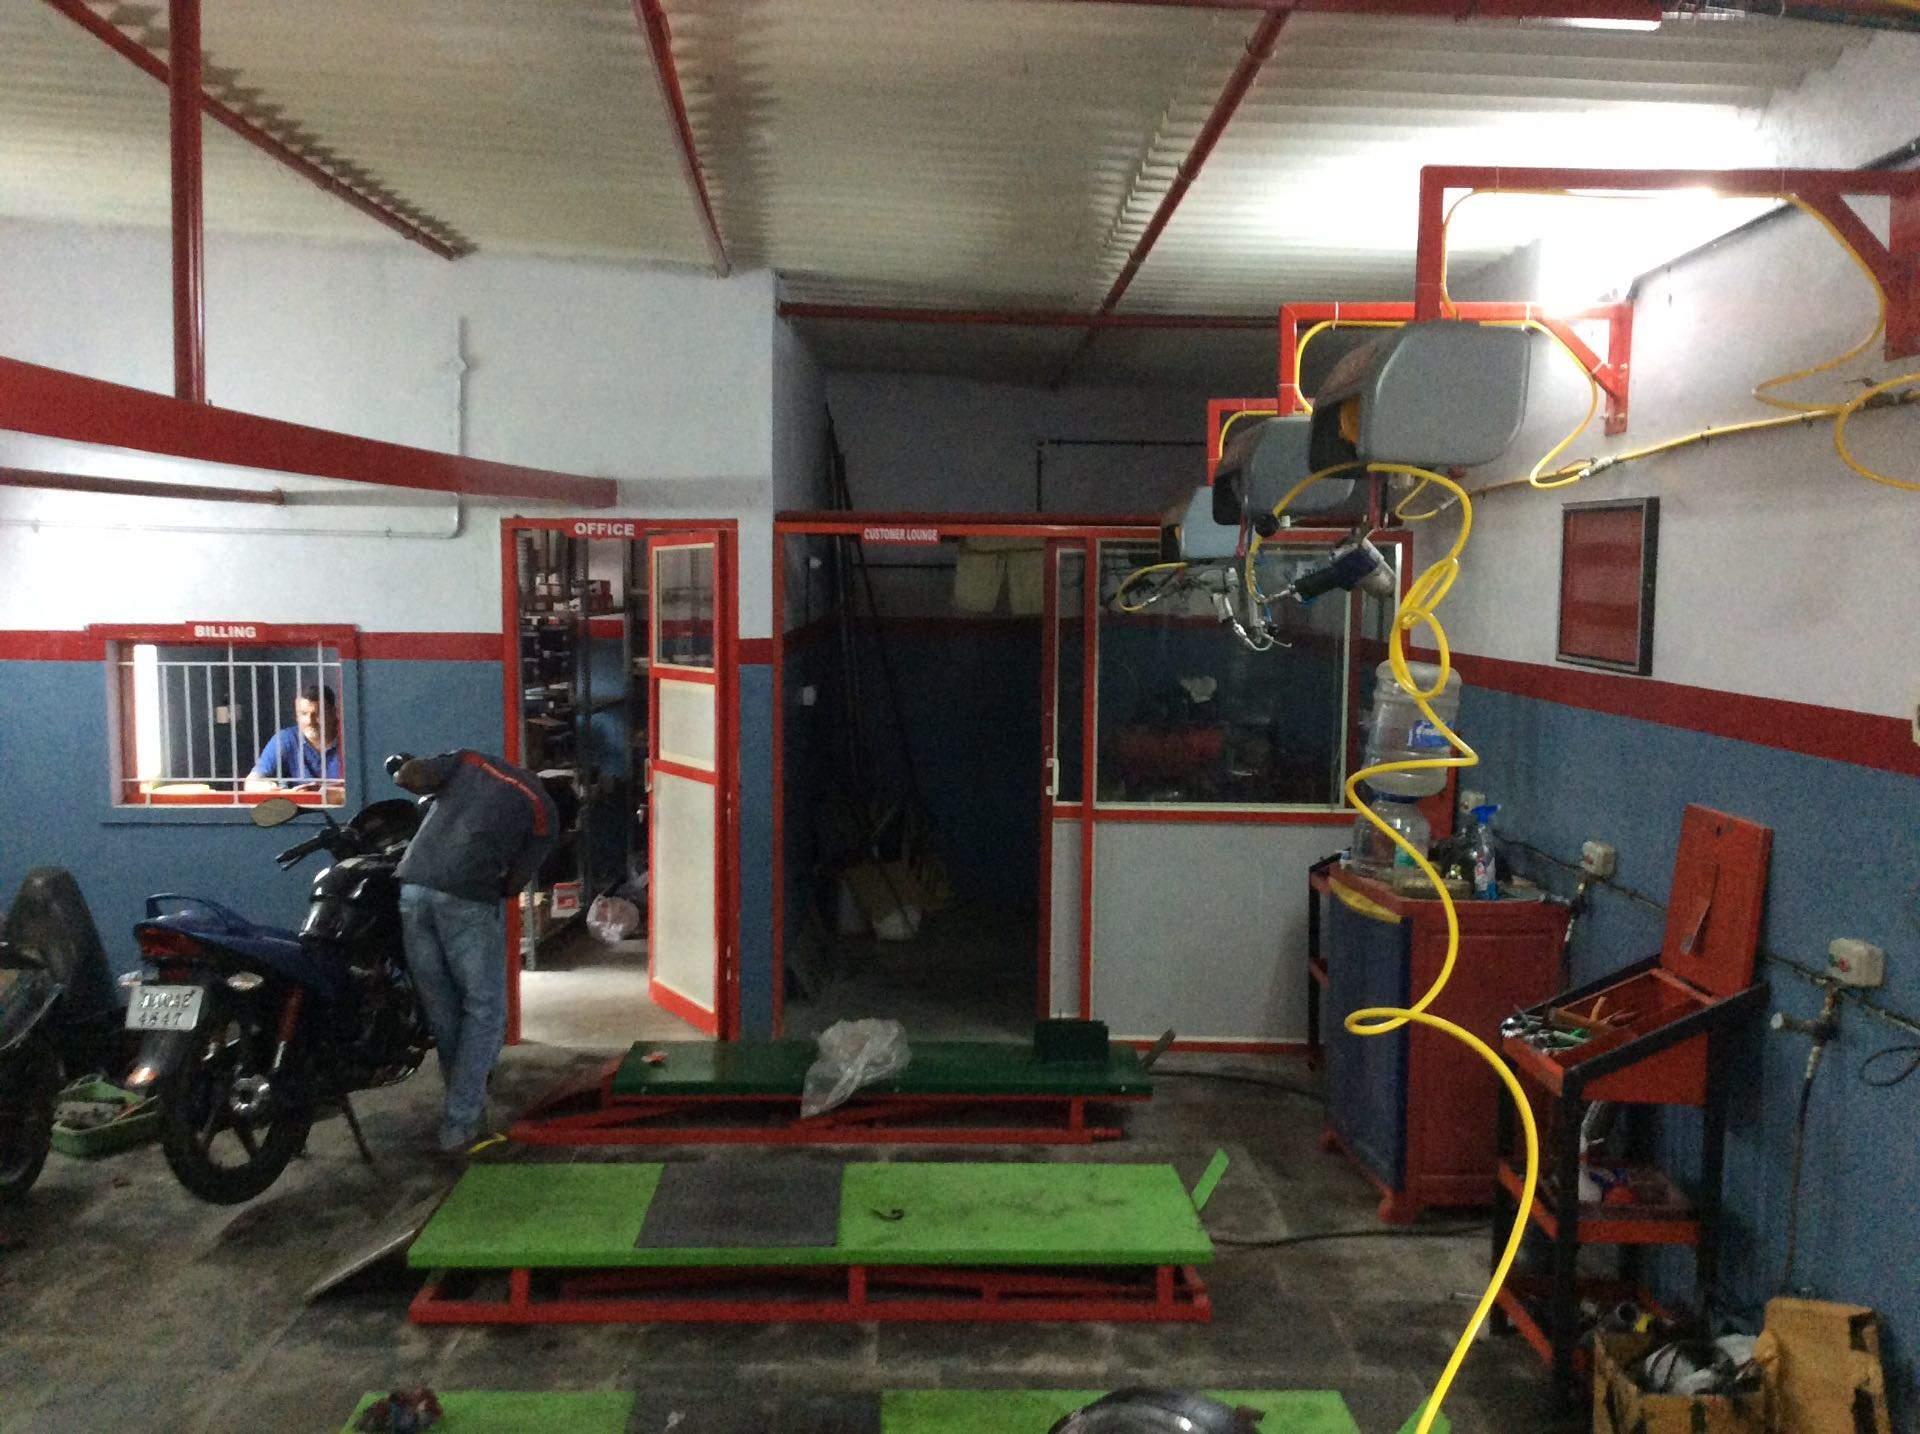 Sri Ganesh Motors Hsr Layout Rto Consultants In Bangalore Justdial